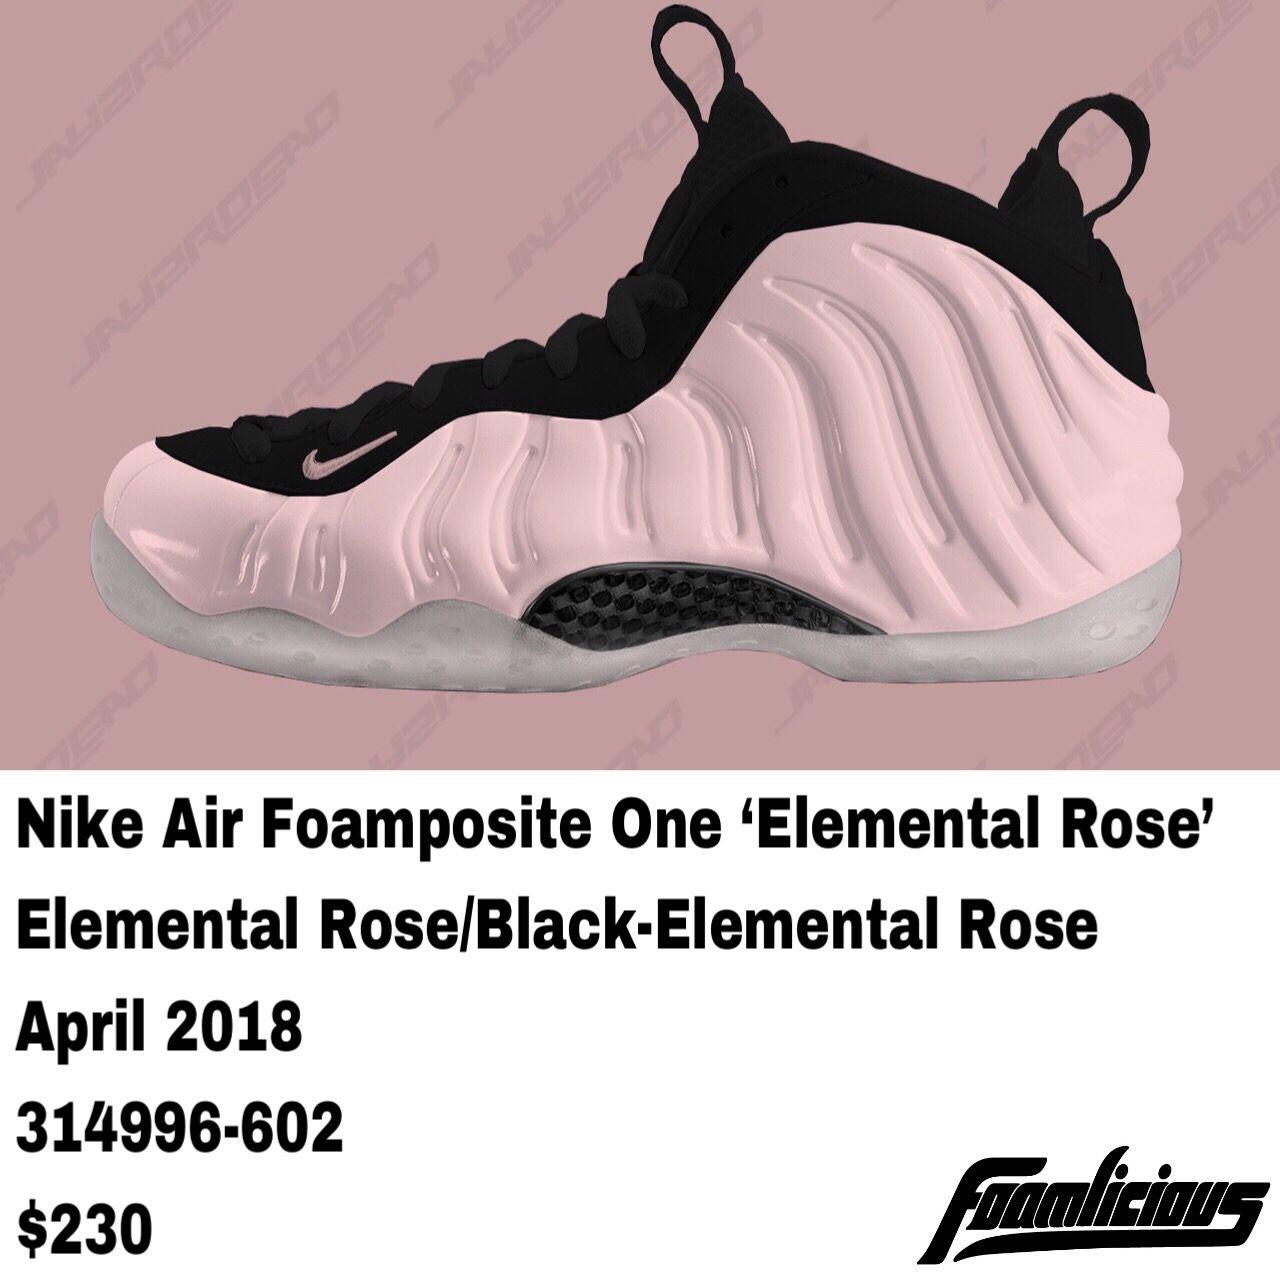 7b6769b05a2 nike air foamposite one elemental rose 314996 602